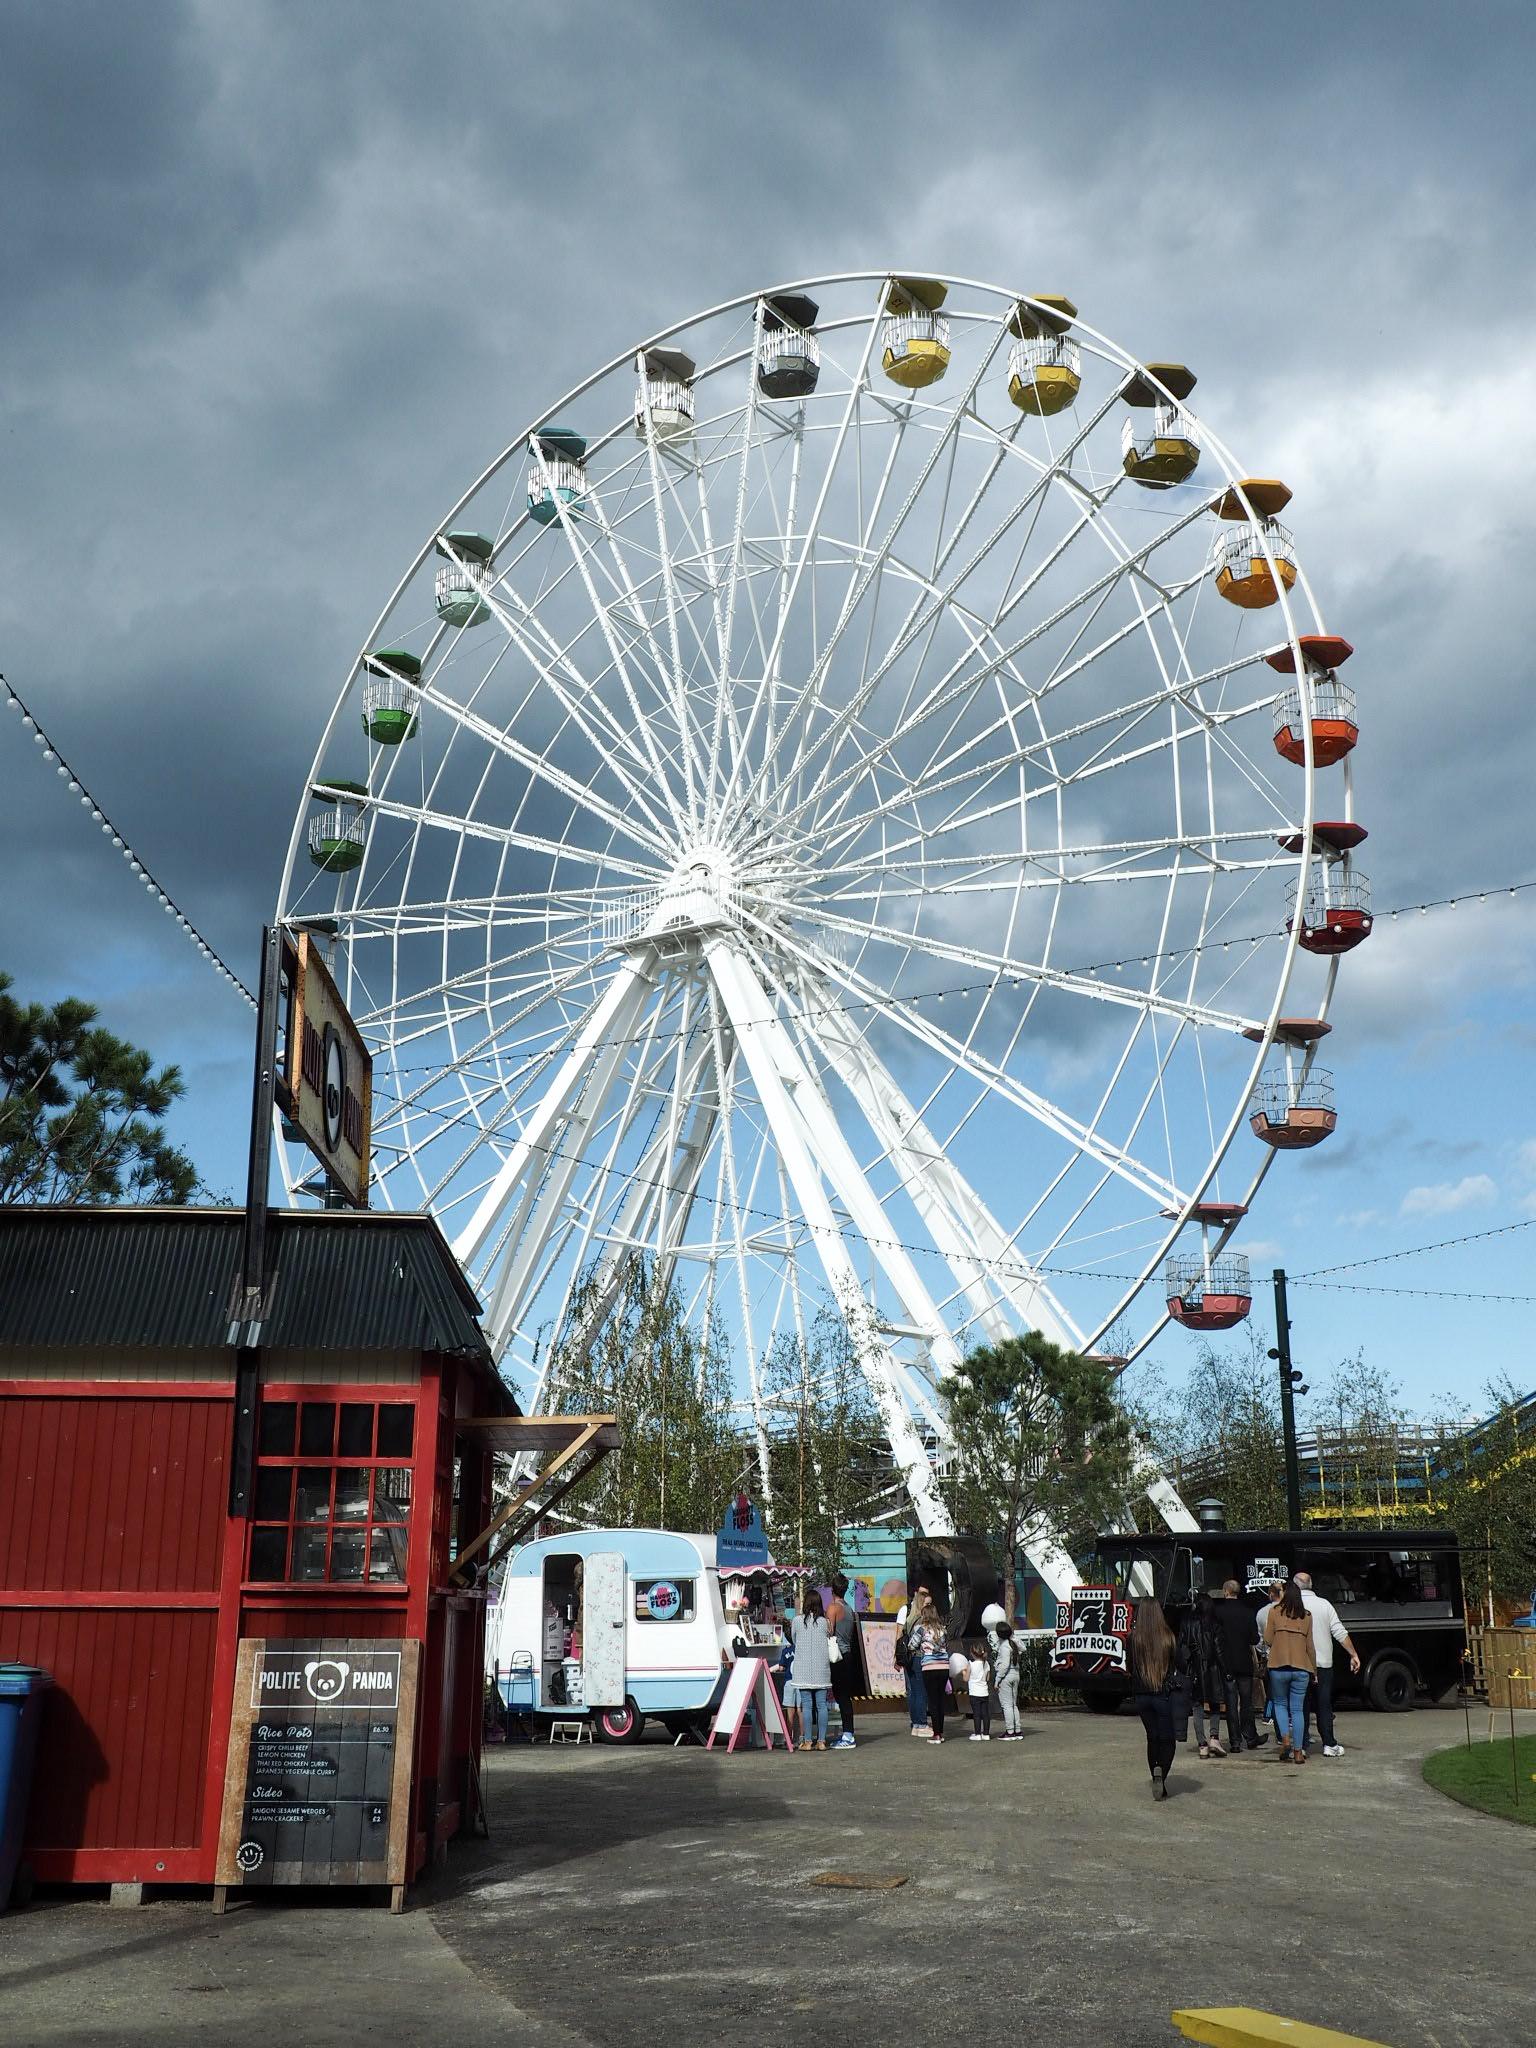 Big wheel at Dreamland